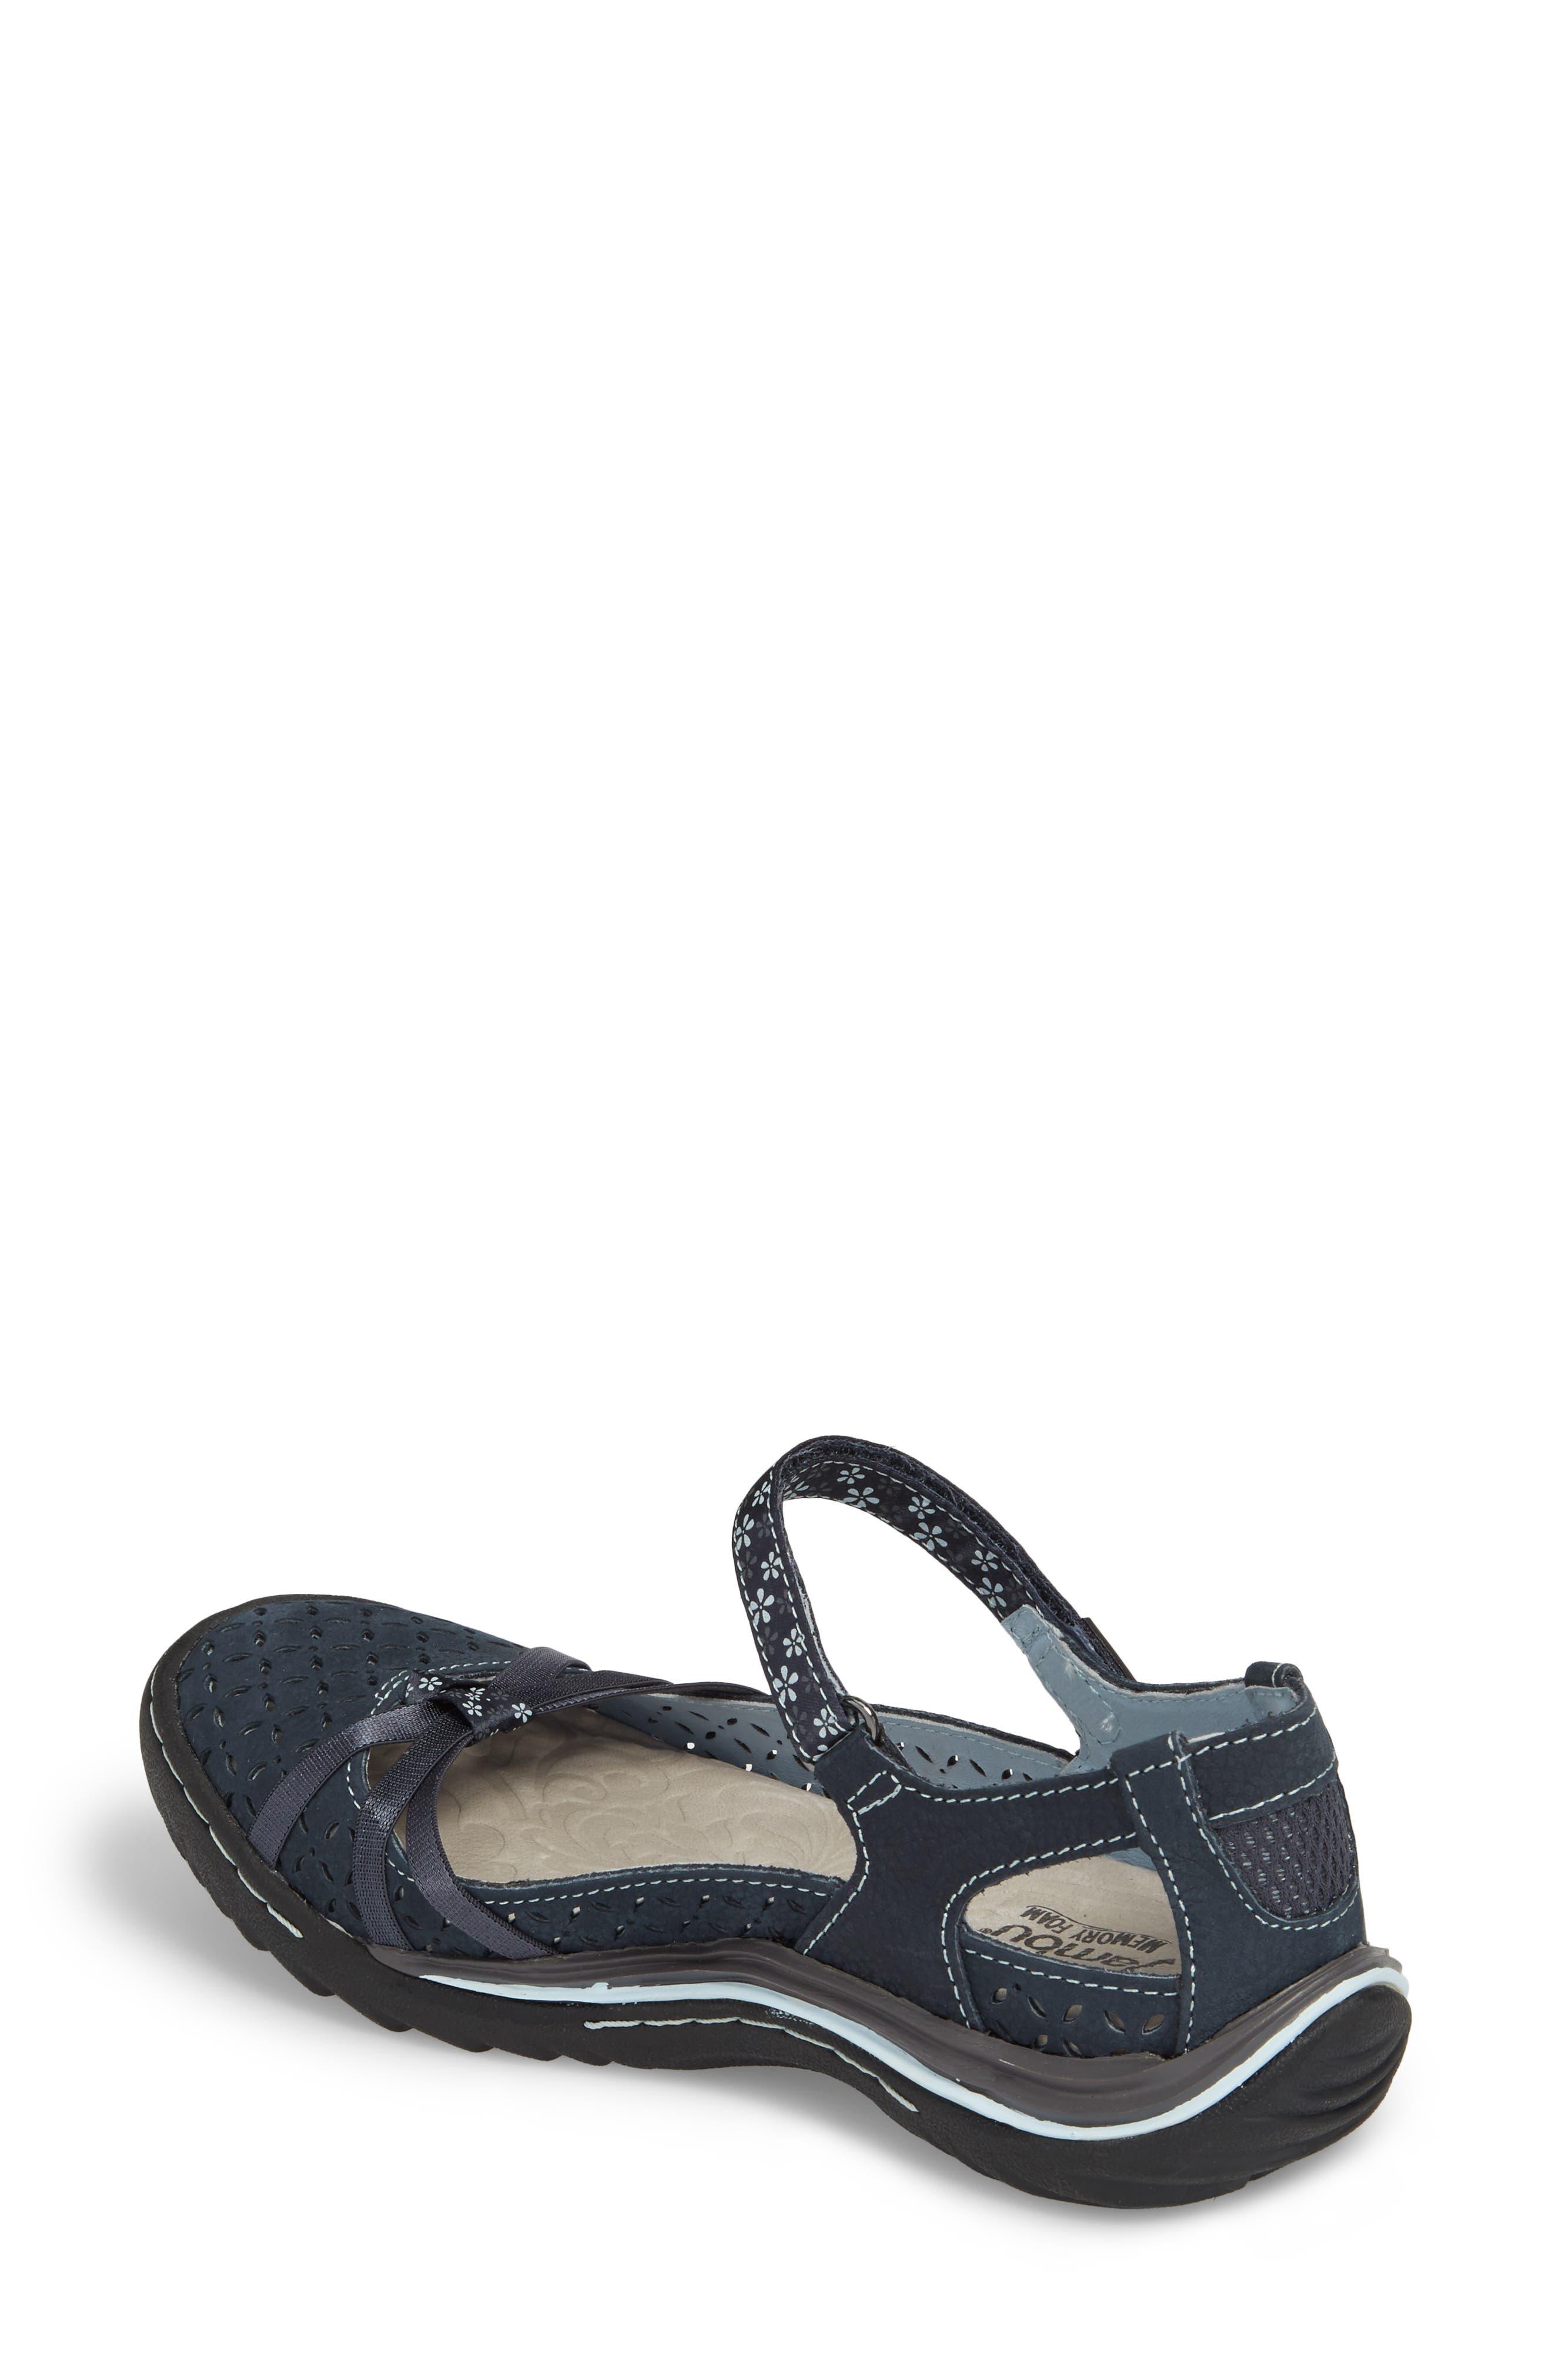 0edf5dc1936cd Jambu Shoes for Women